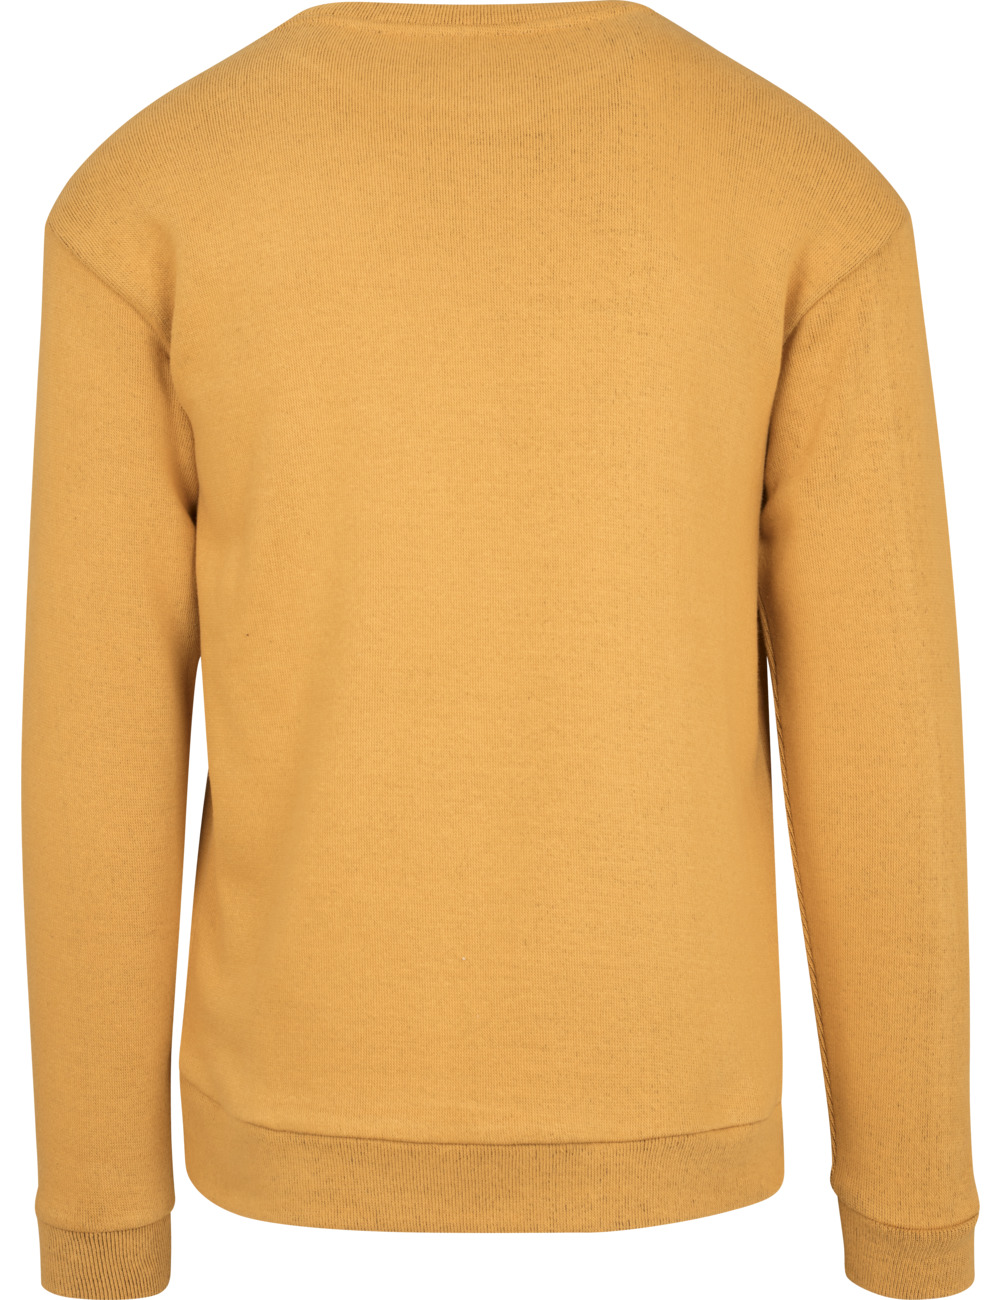 urban-classics-herren-sweater-texture-crewneck